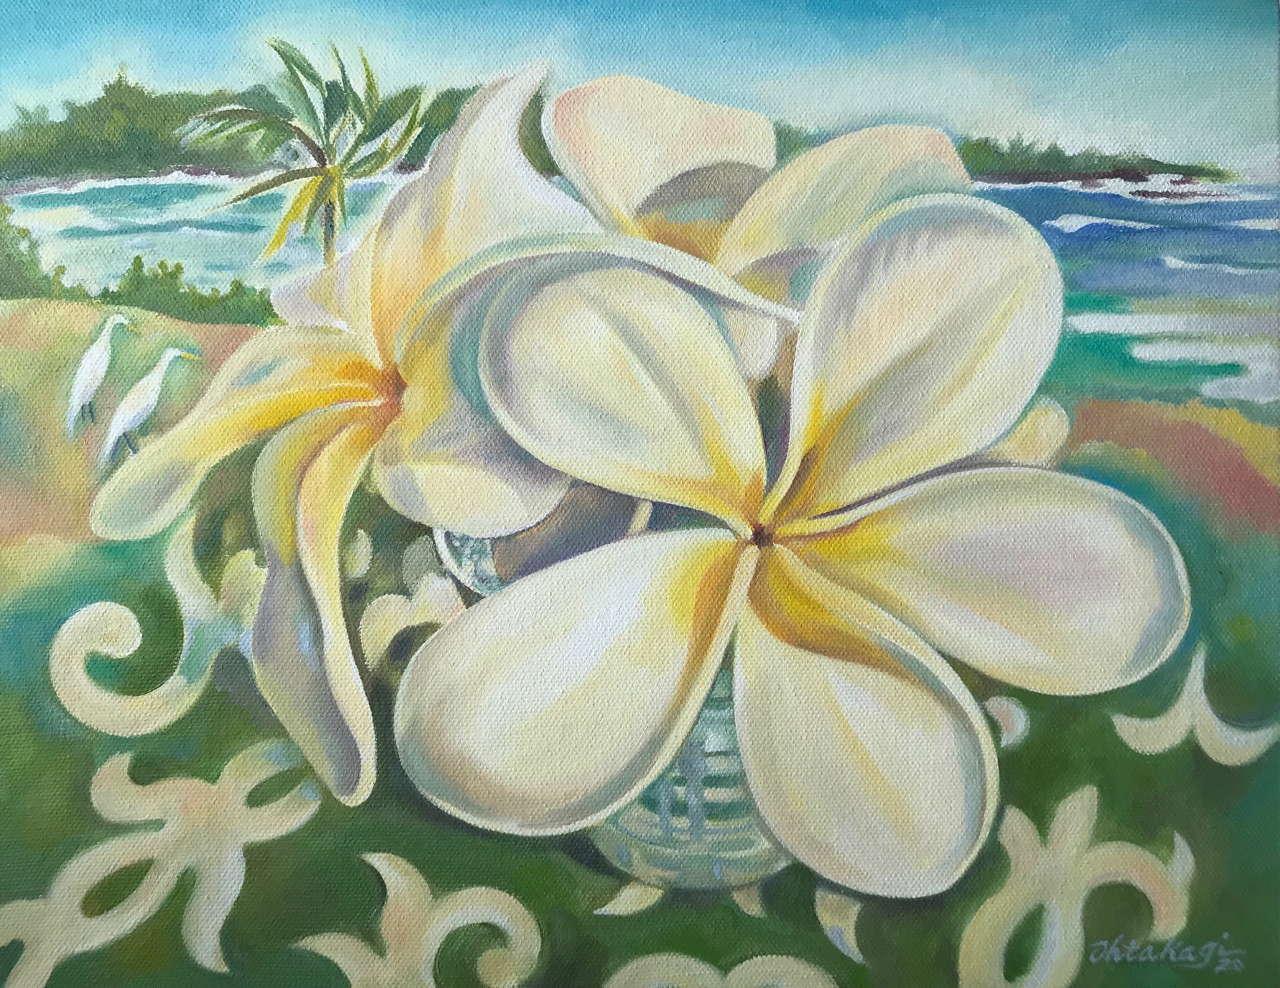 Original Oil by Artist Hilo Ohtakagi